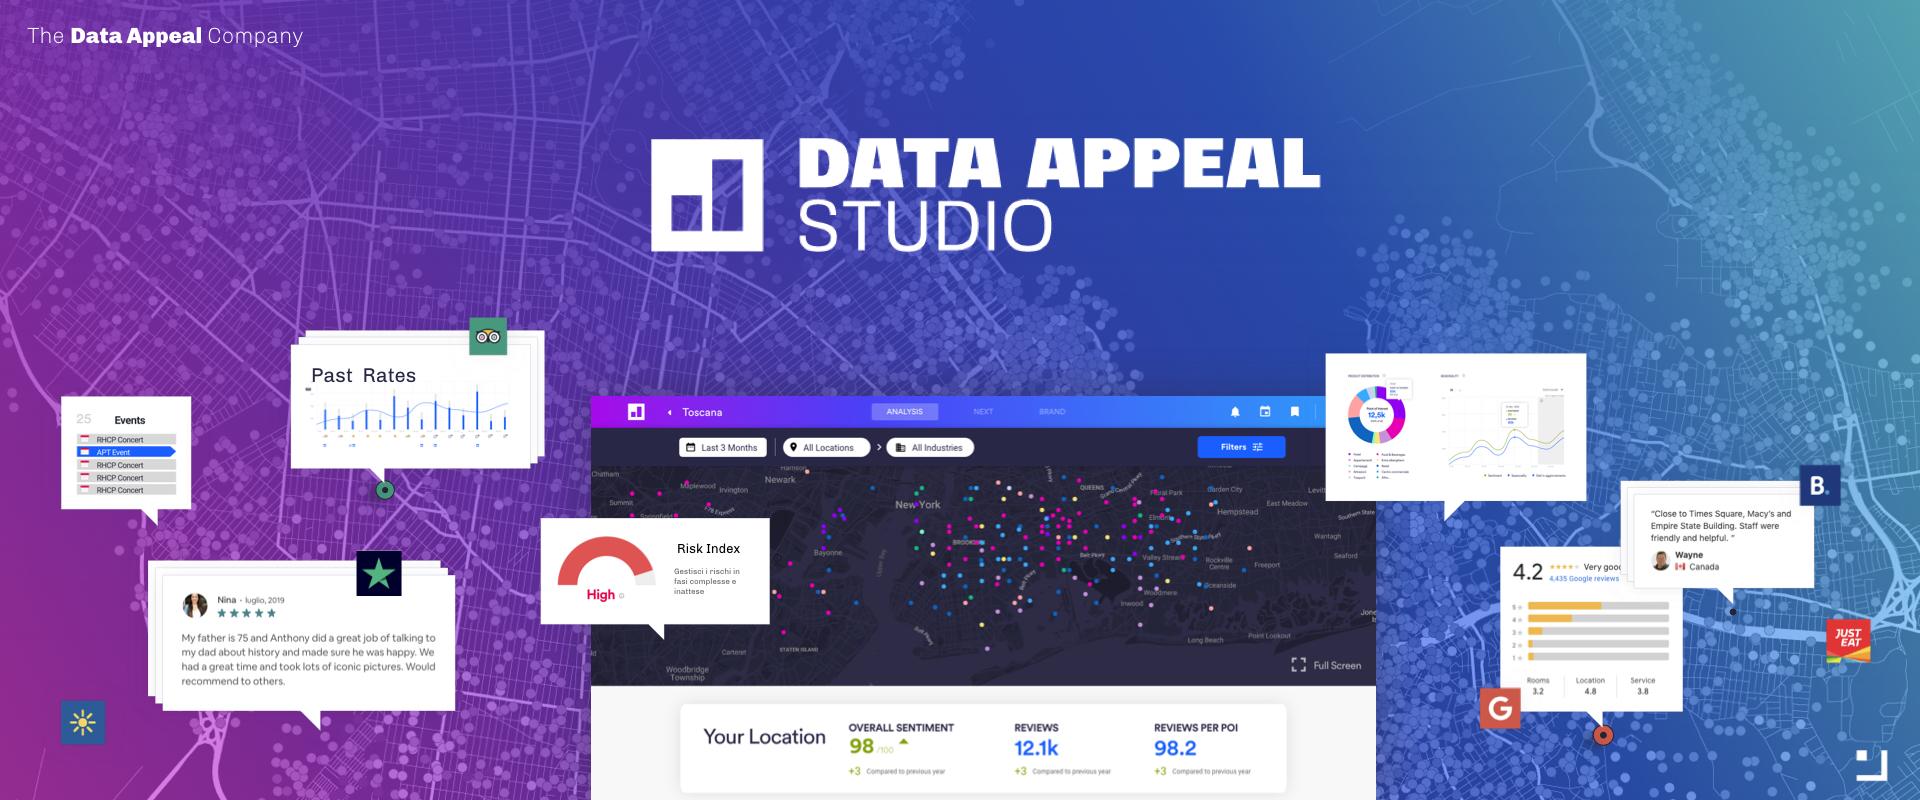 Data Appeal Studio Hero